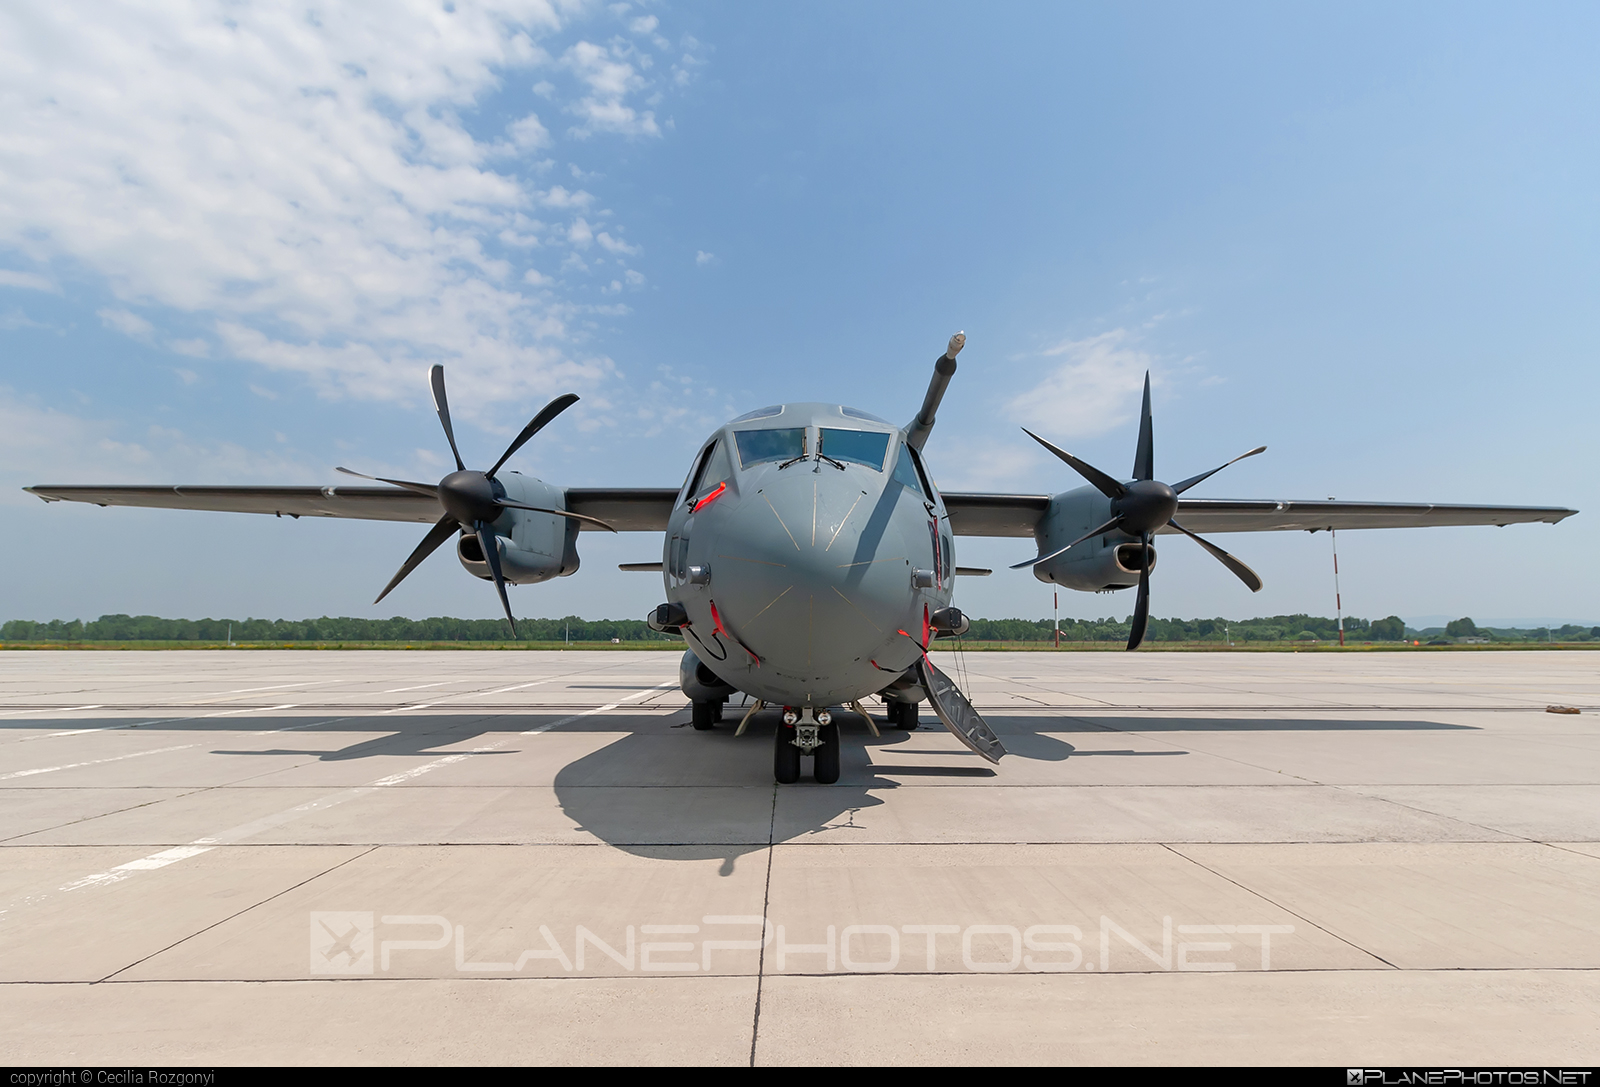 Alenia C-27J Spartan - 06 operated by Lietuvos karinės oro pajėgos (Lithuanian Air Force) #alenia #aleniac27j #aleniac27jspartan #aleniaspartan #c27j #c27jspartan #c27spartan